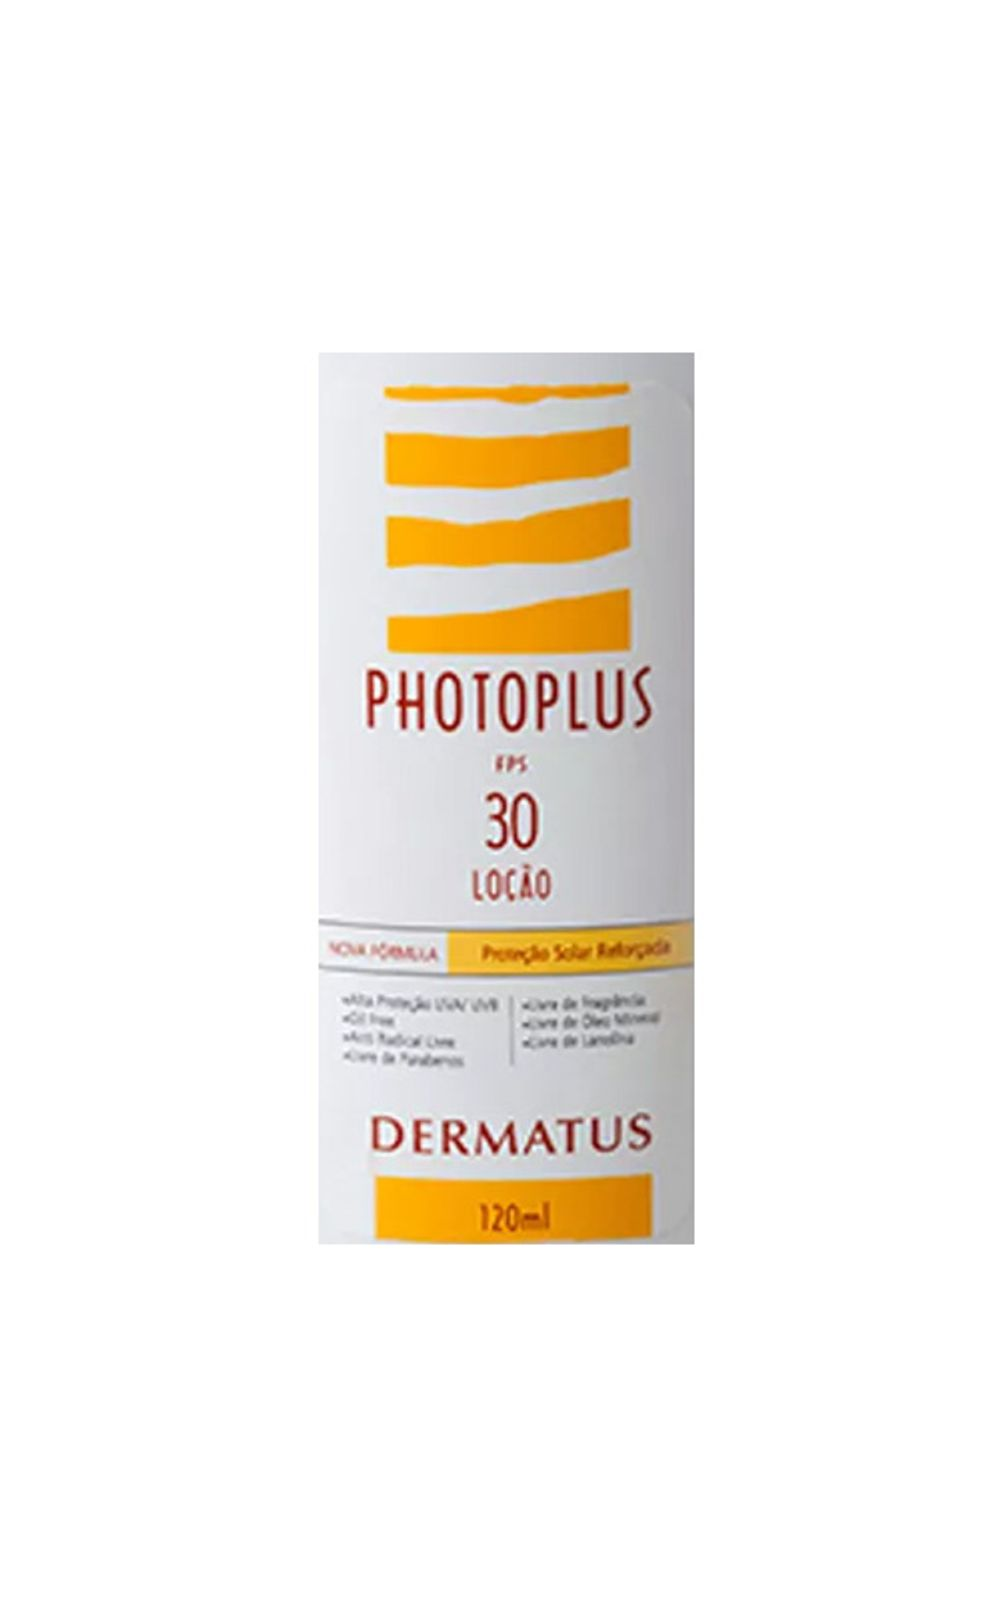 Foto 2 - Photoplus Loção FPS30 Dermatus - Protetor Solar - 120ml